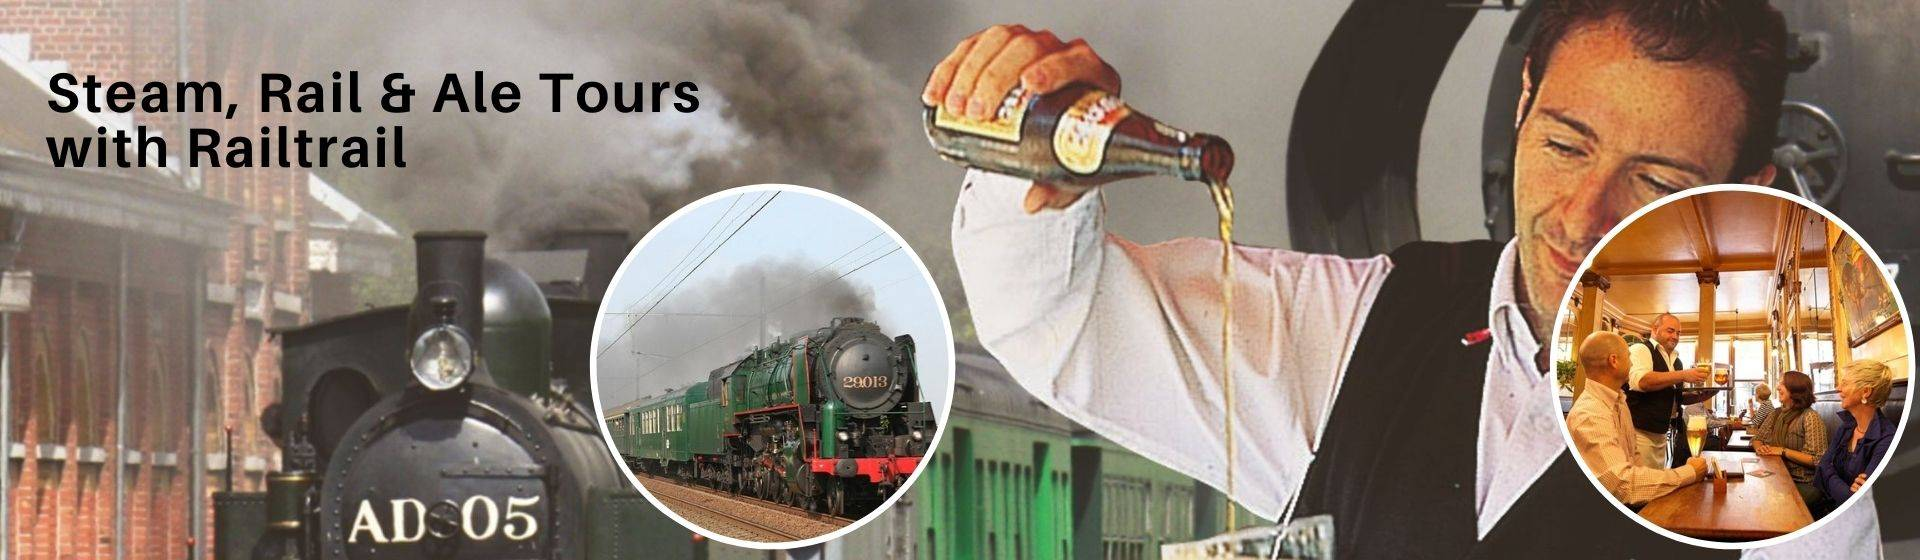 "<img src=""steam,rail&aletourswithrailtrail.jpeg"" alt=""Steam, Rail & Ale Trails""/>"